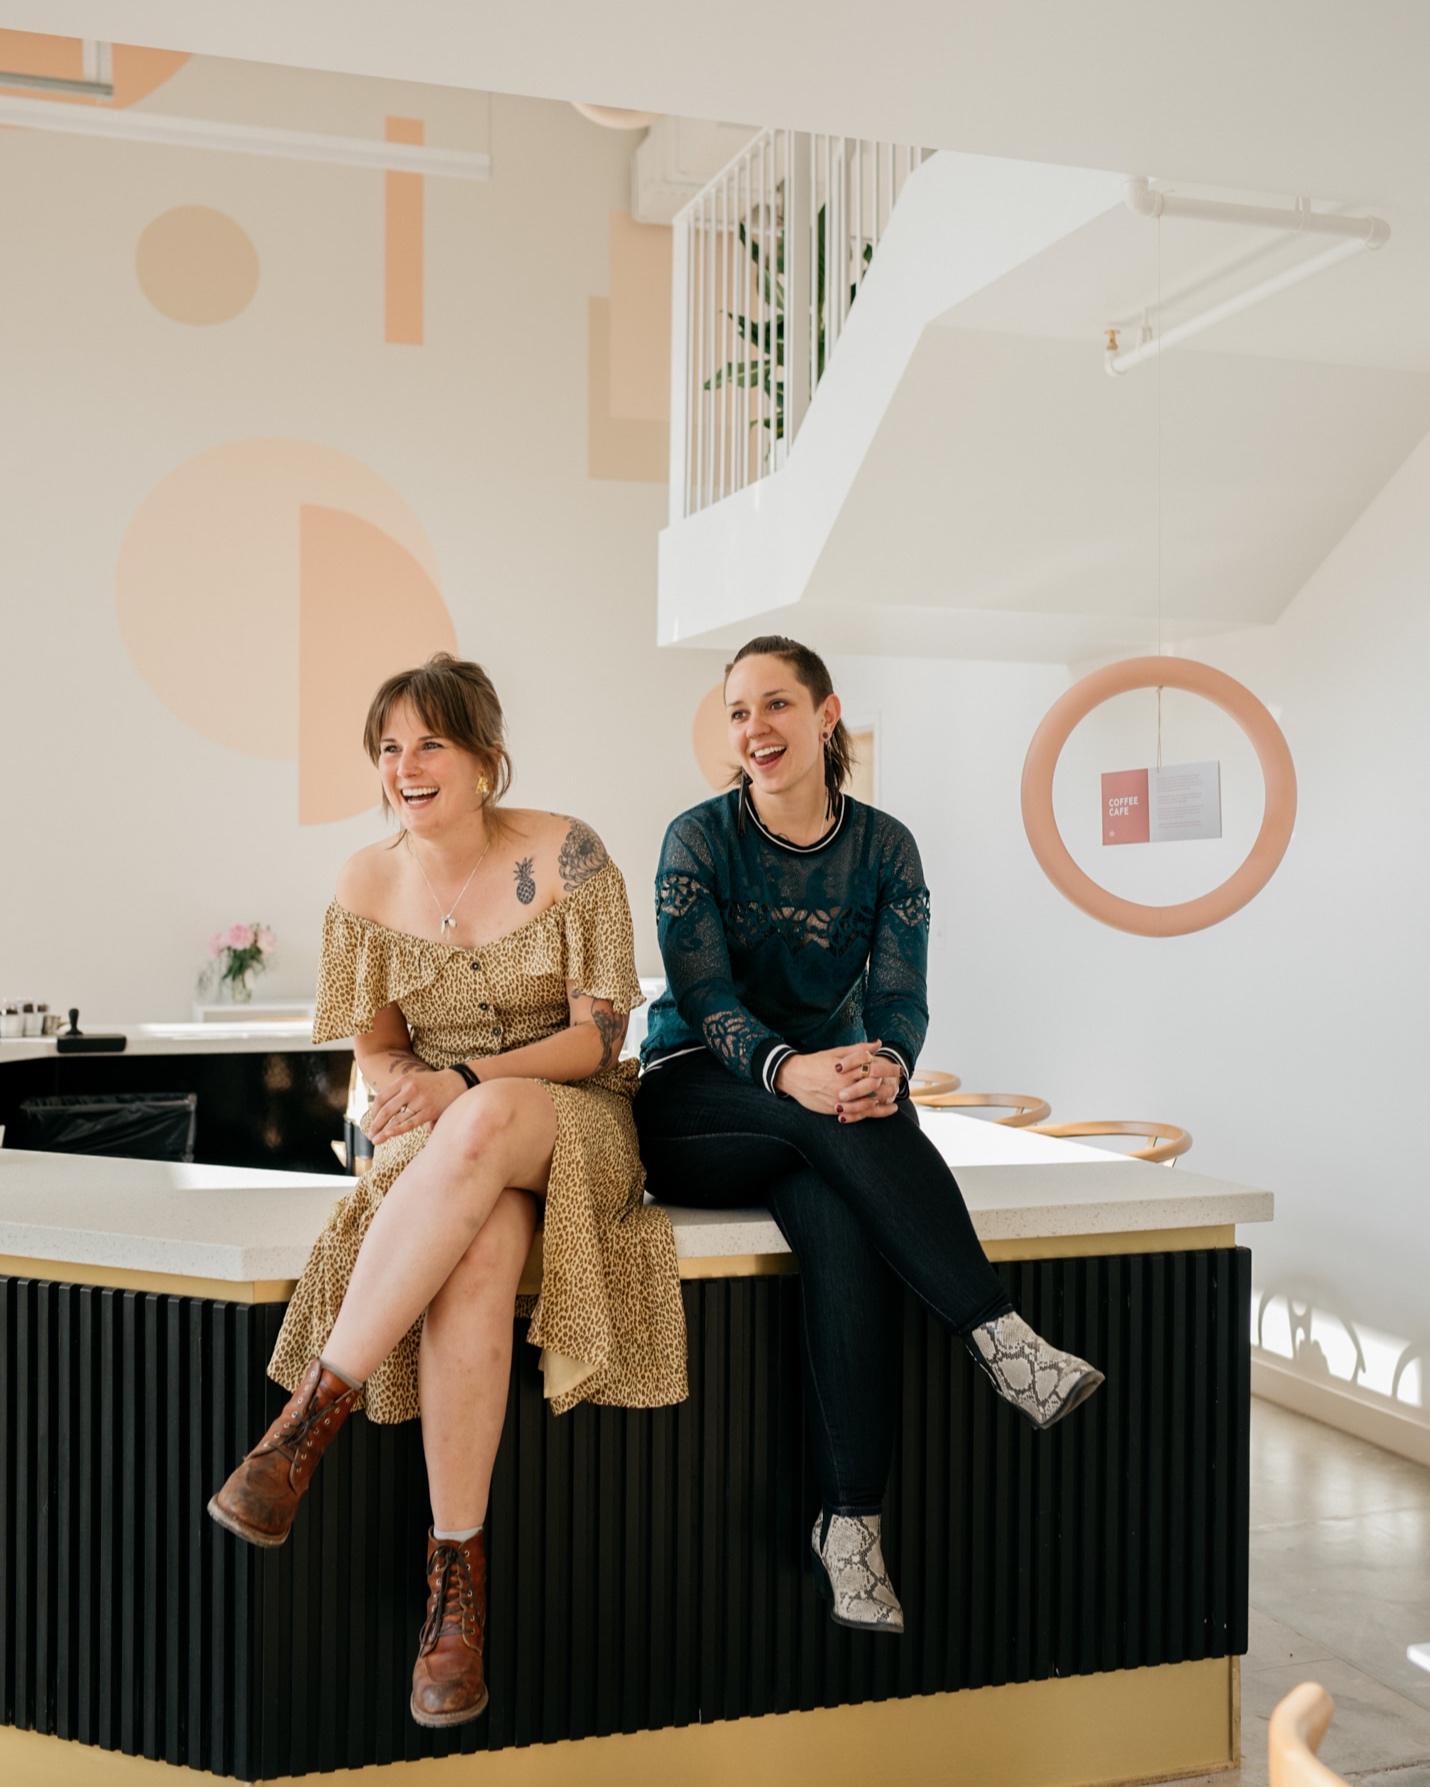 Elle Jensen & Breezy Sanches, Owners of Amethyst Coffee